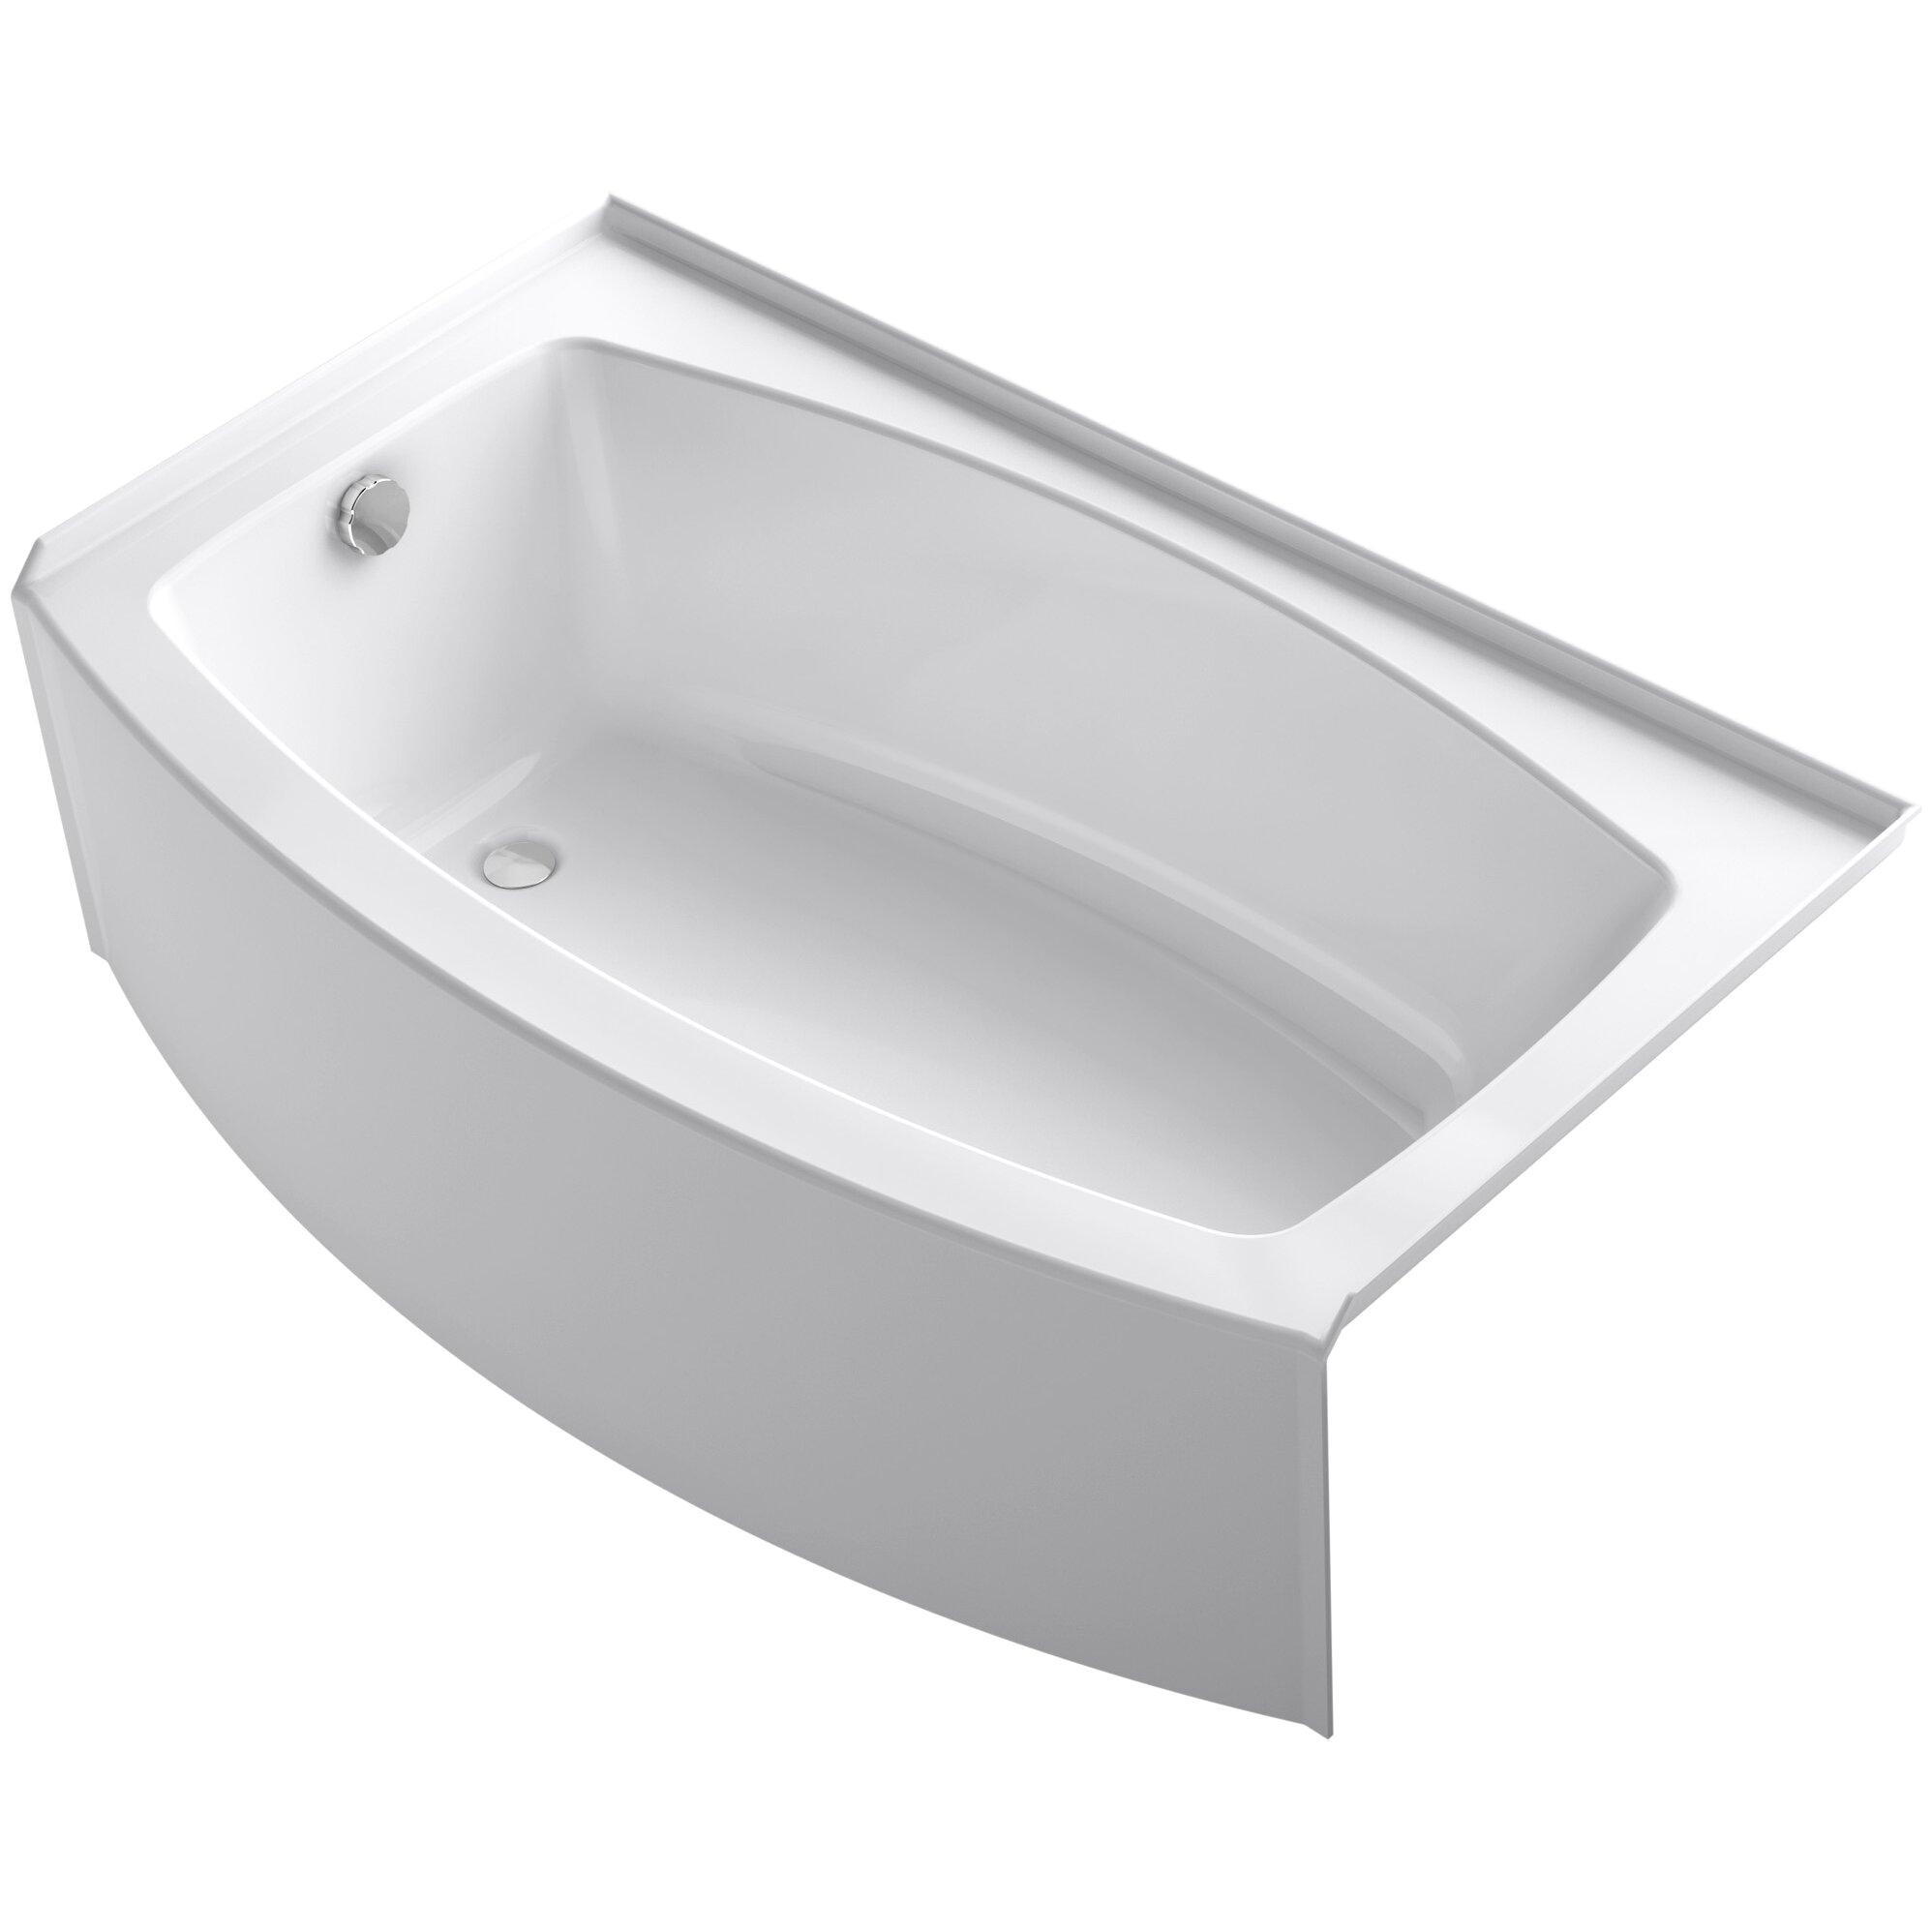 Kohler Expanse 60 x 30 36 Soaking Bathtub KOH